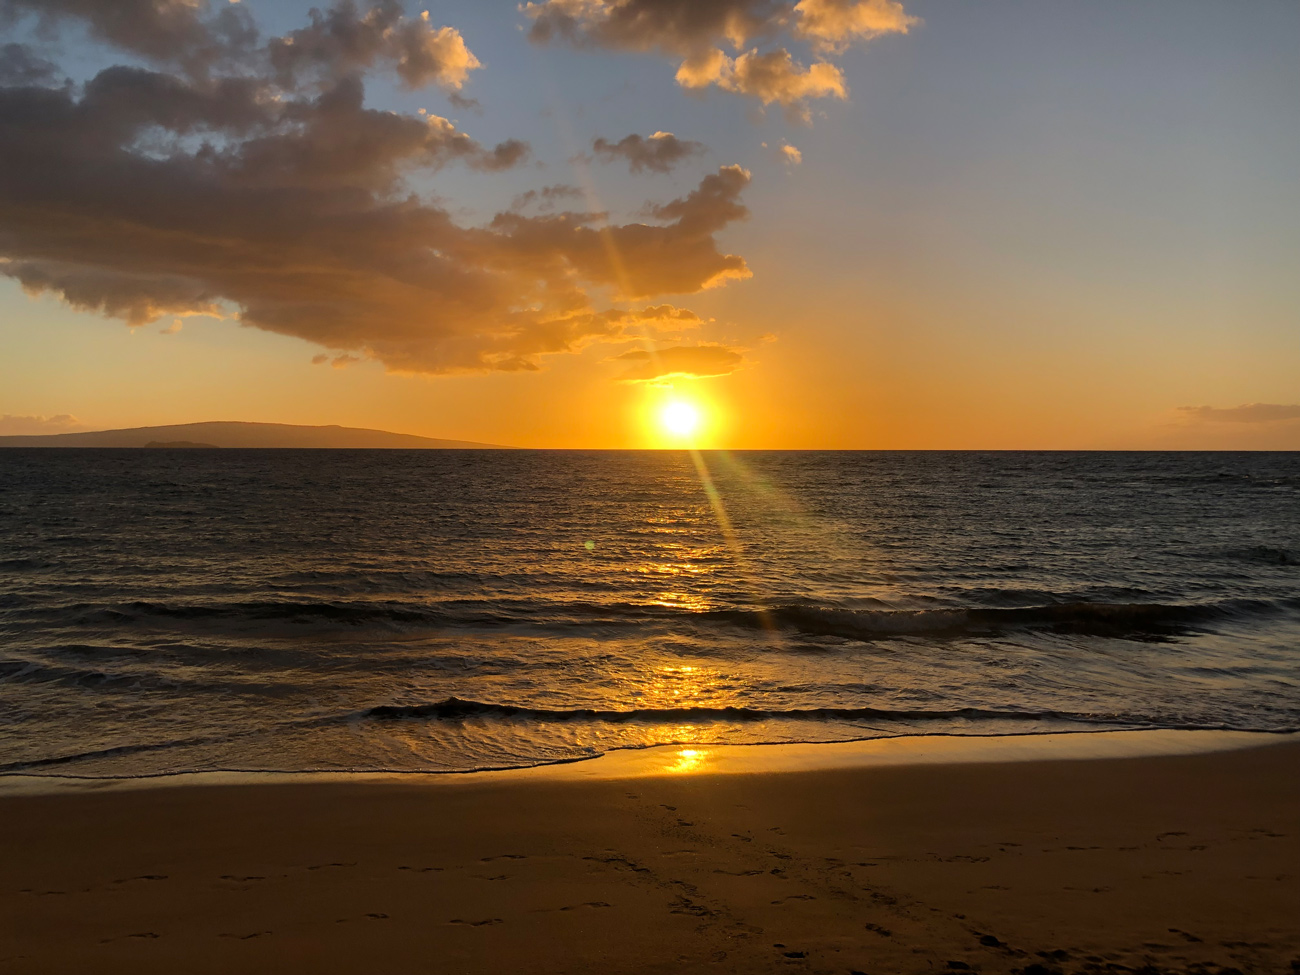 Maui Hawaii Sonnenuntergang